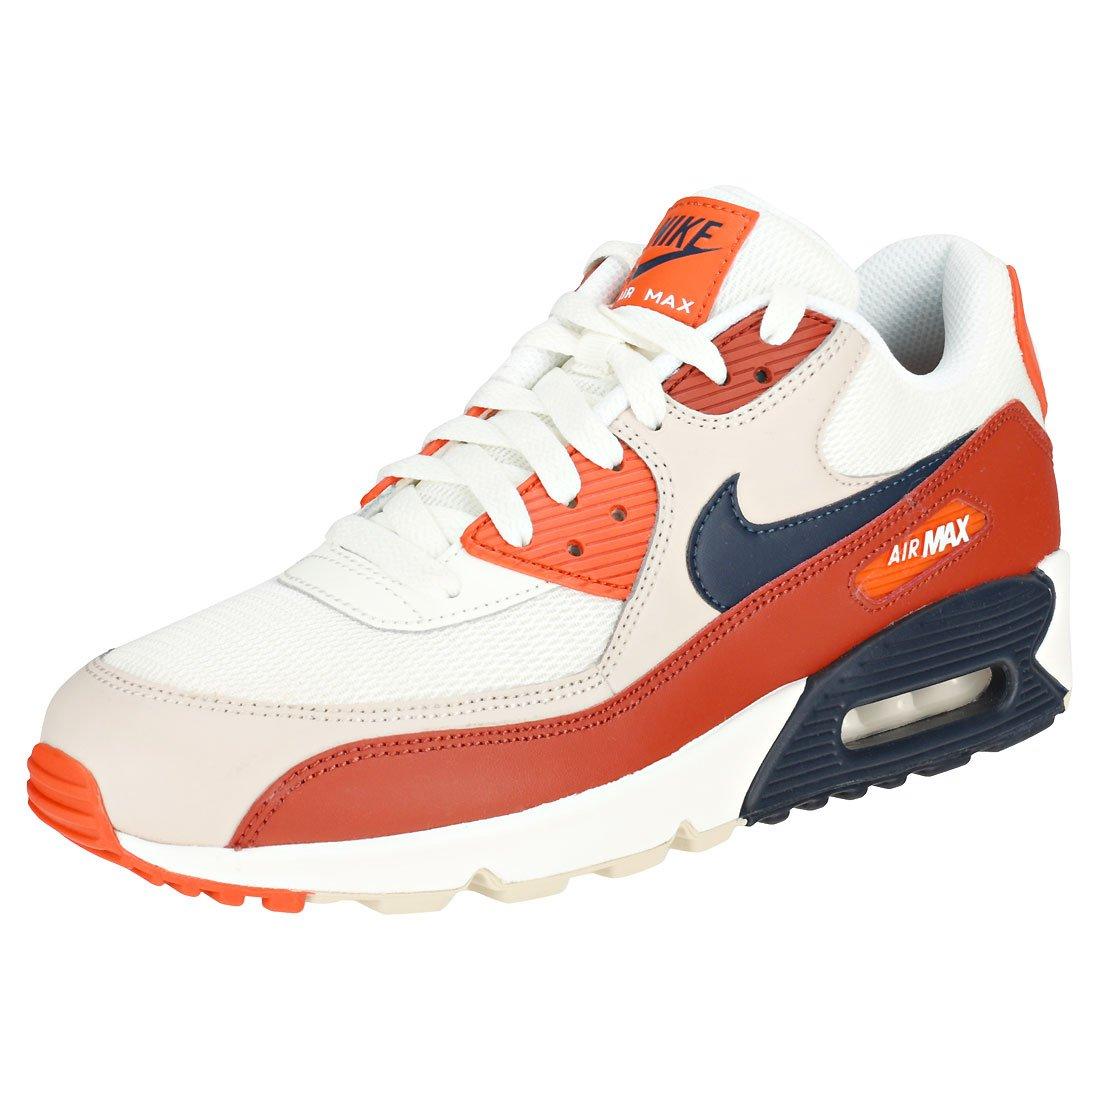 NIKE Men's Air Max 90 Essential Running Shoe B07DDMNCP3 11.5 M US|Mars Stone/Obsidian/Vintage Coral